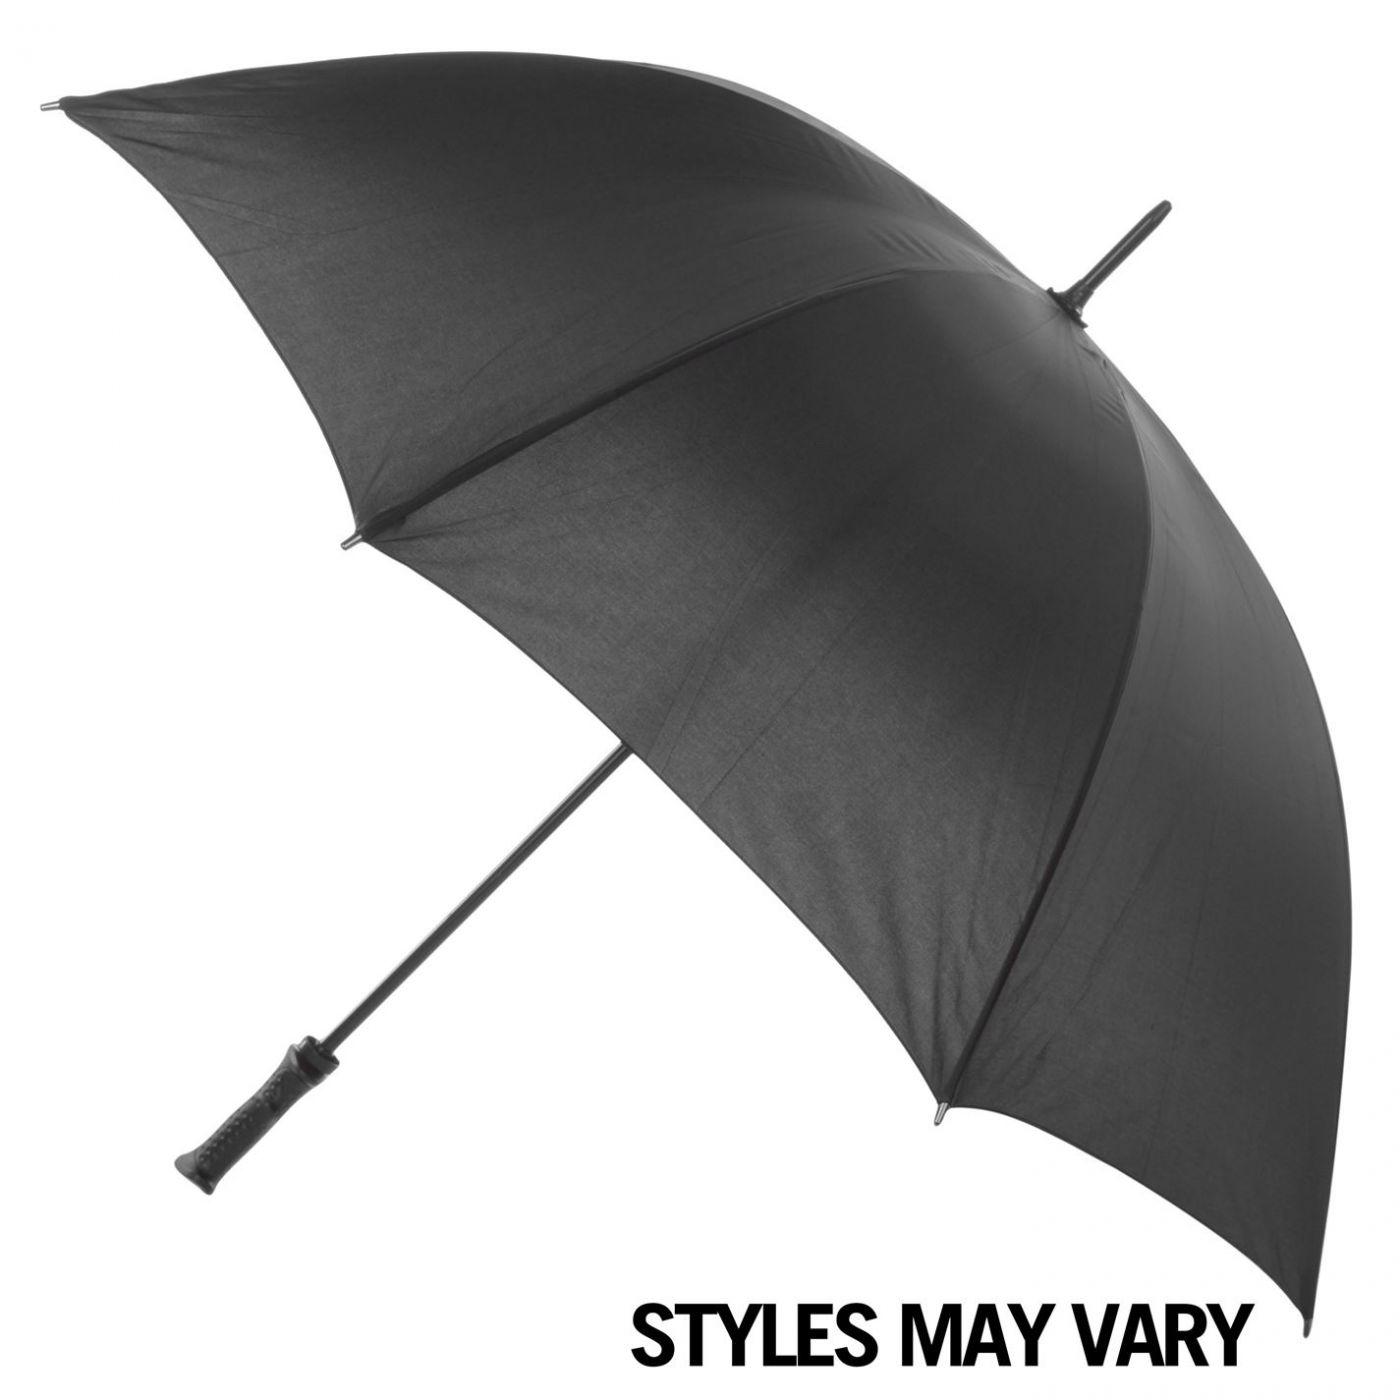 Slazenger Umbrella